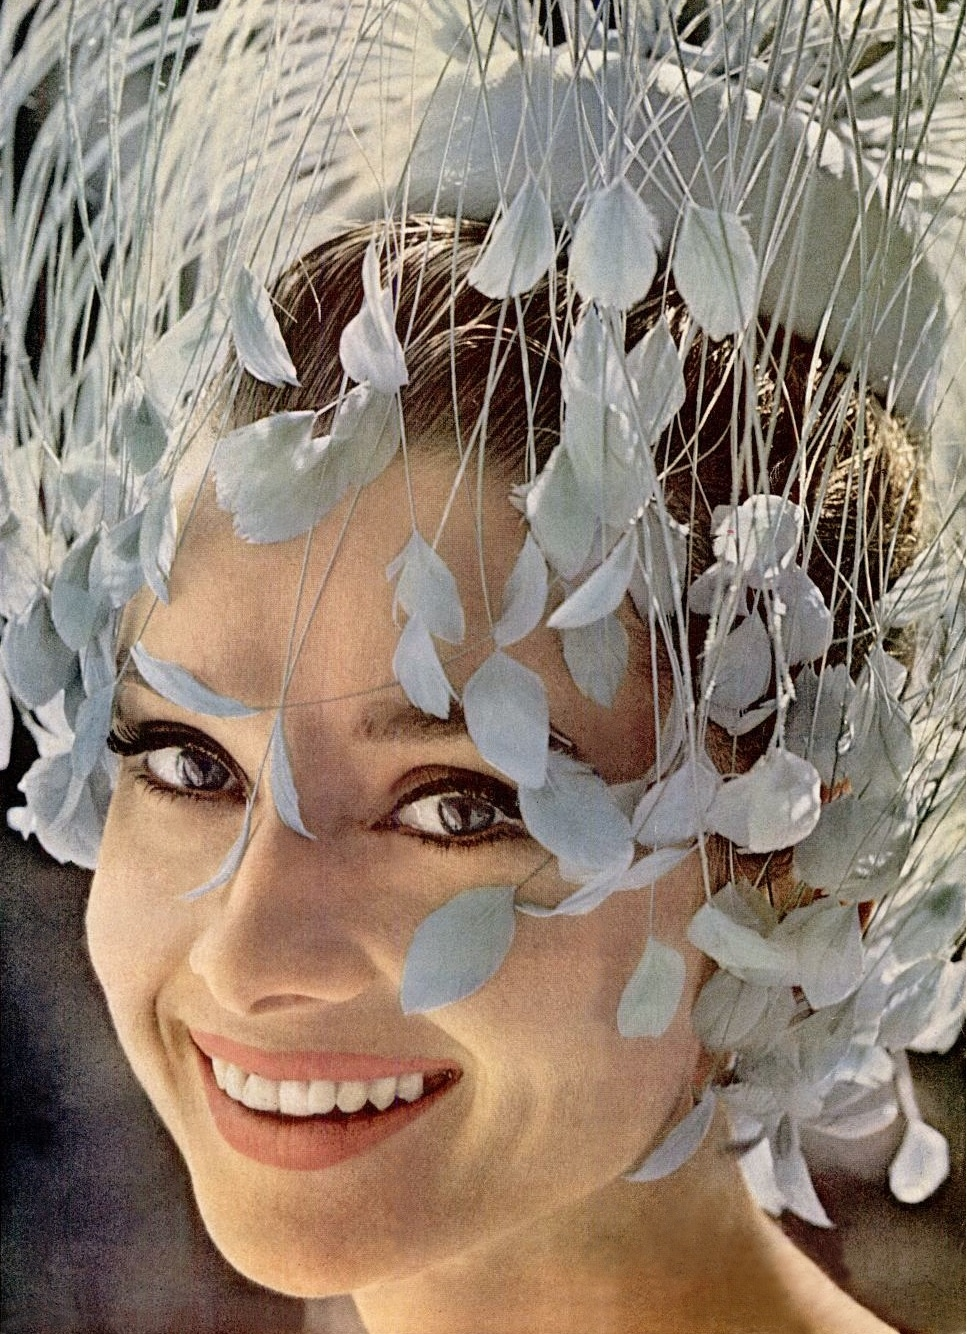 LIFE Magazine April 20, 1962 Audrey Hepburn Cover Detail.jpg